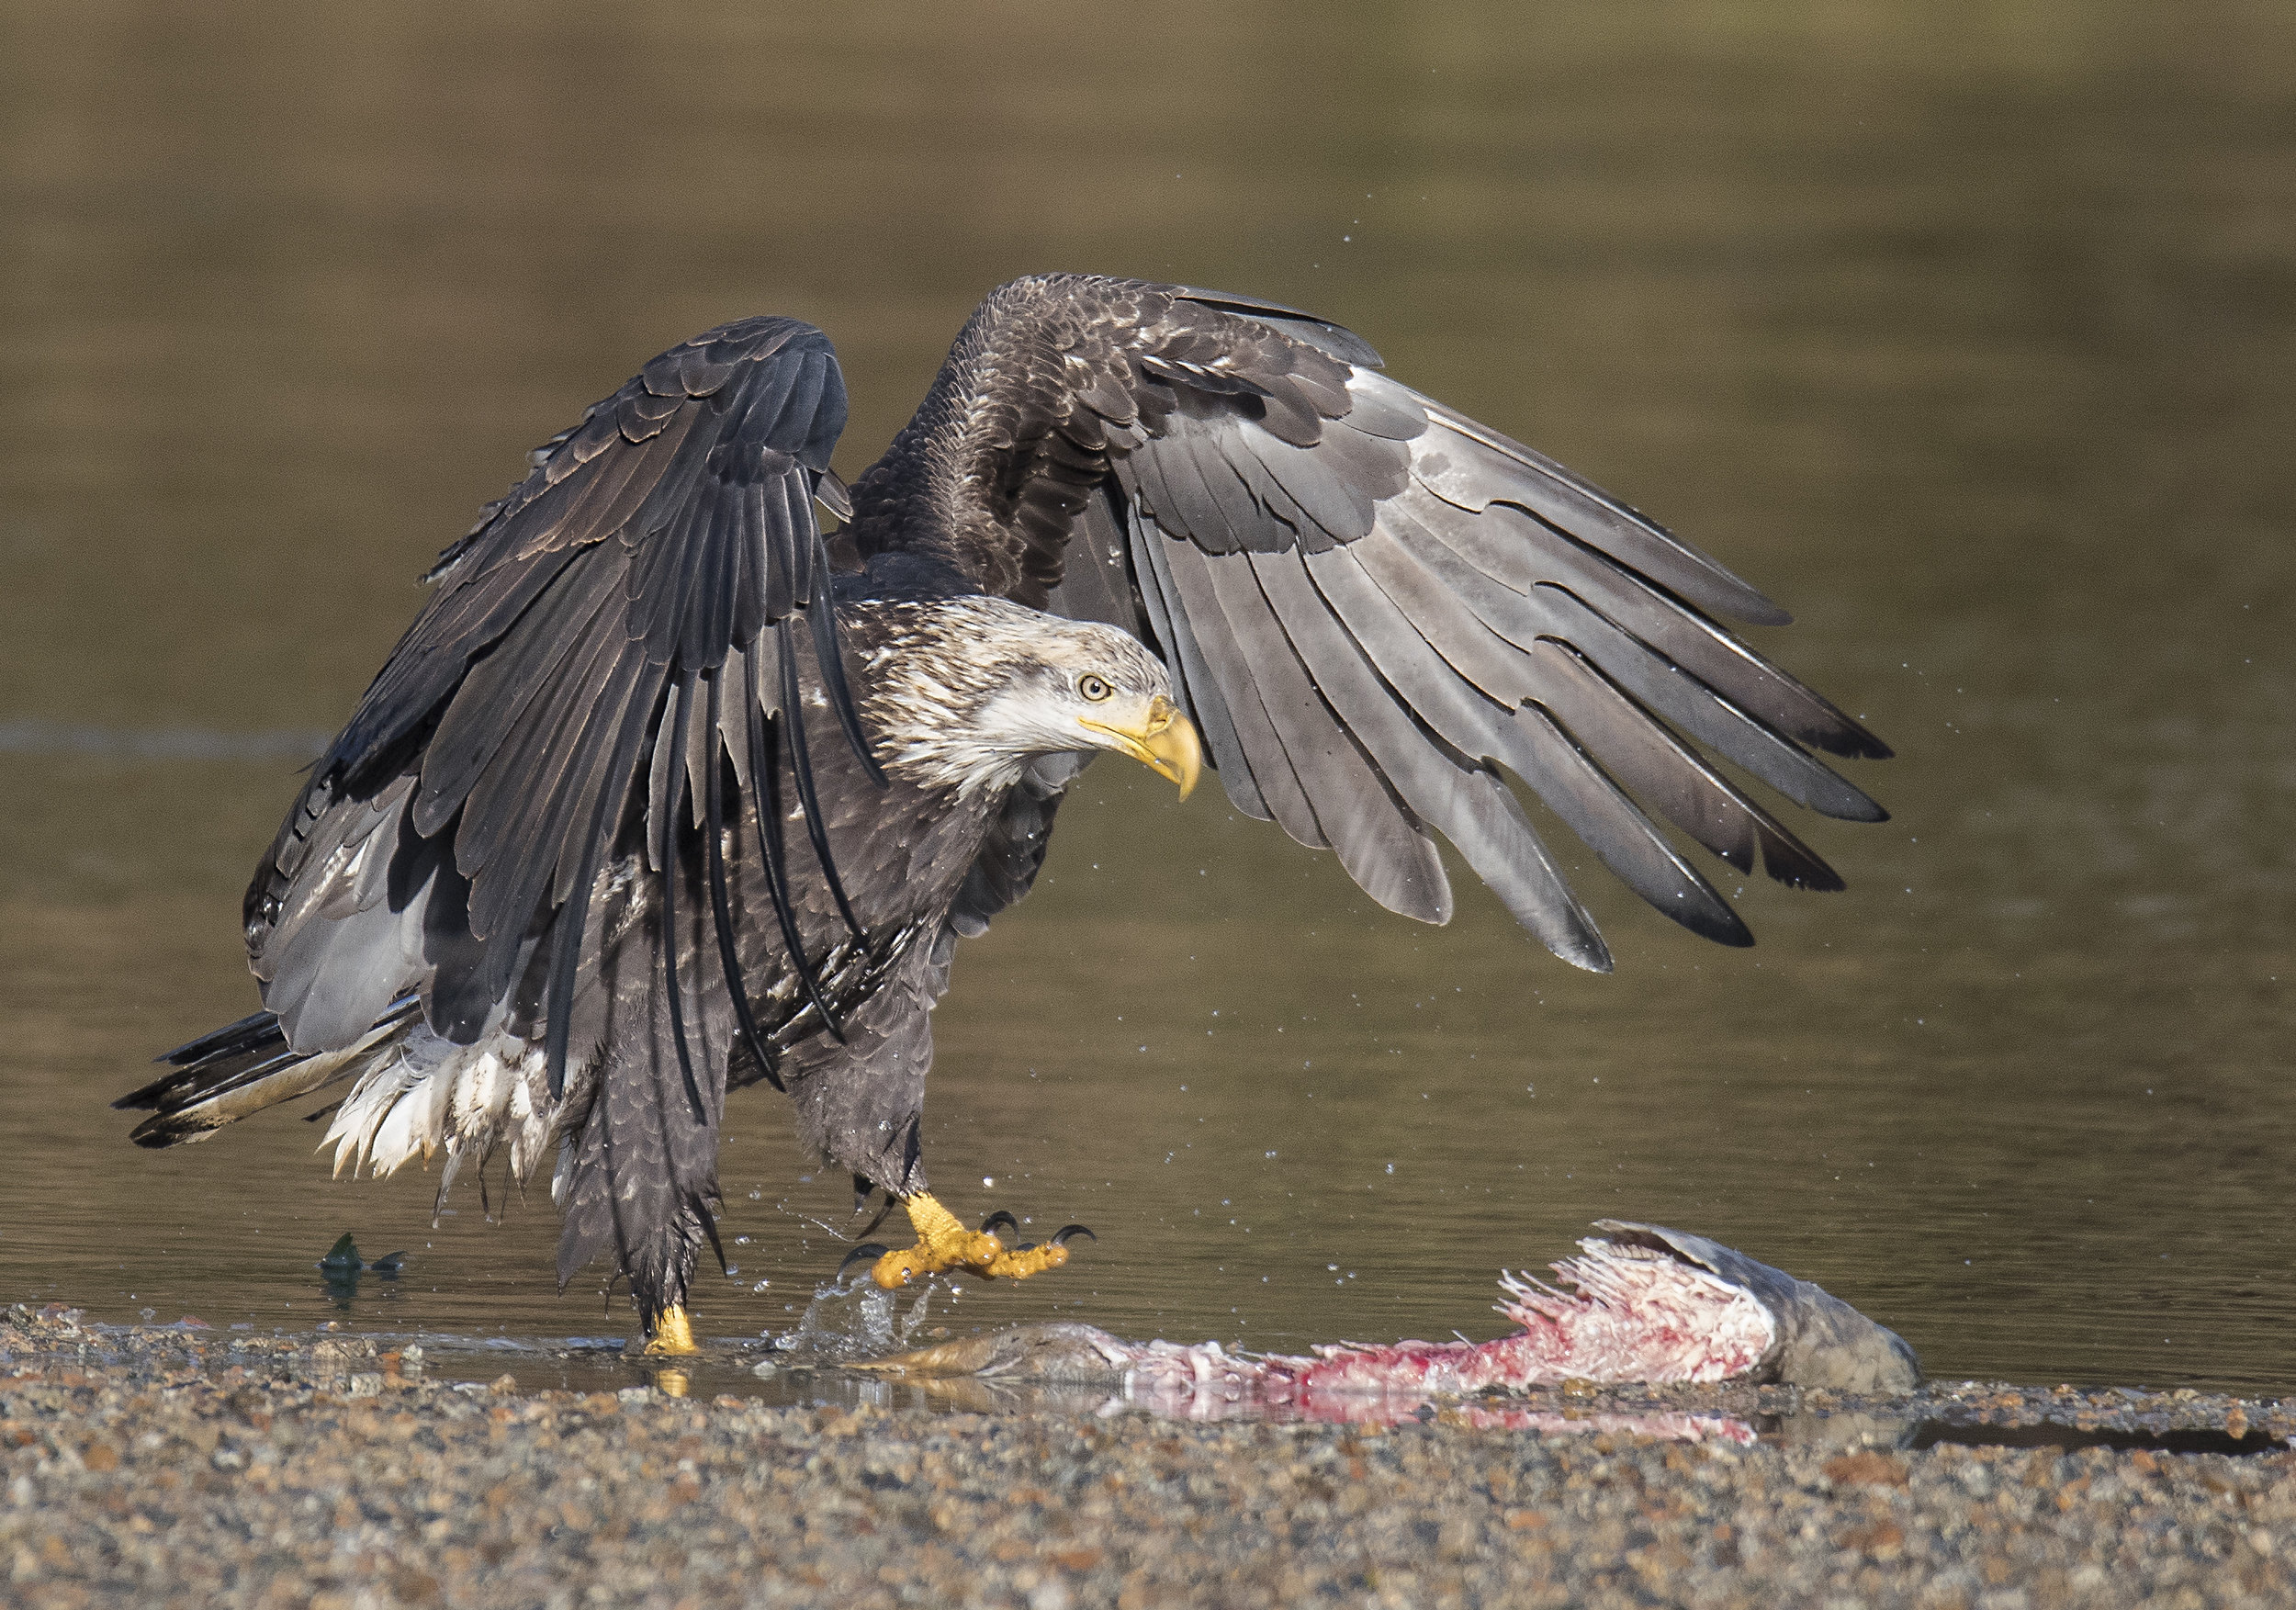 bald eagle walking towards salmon.jpg